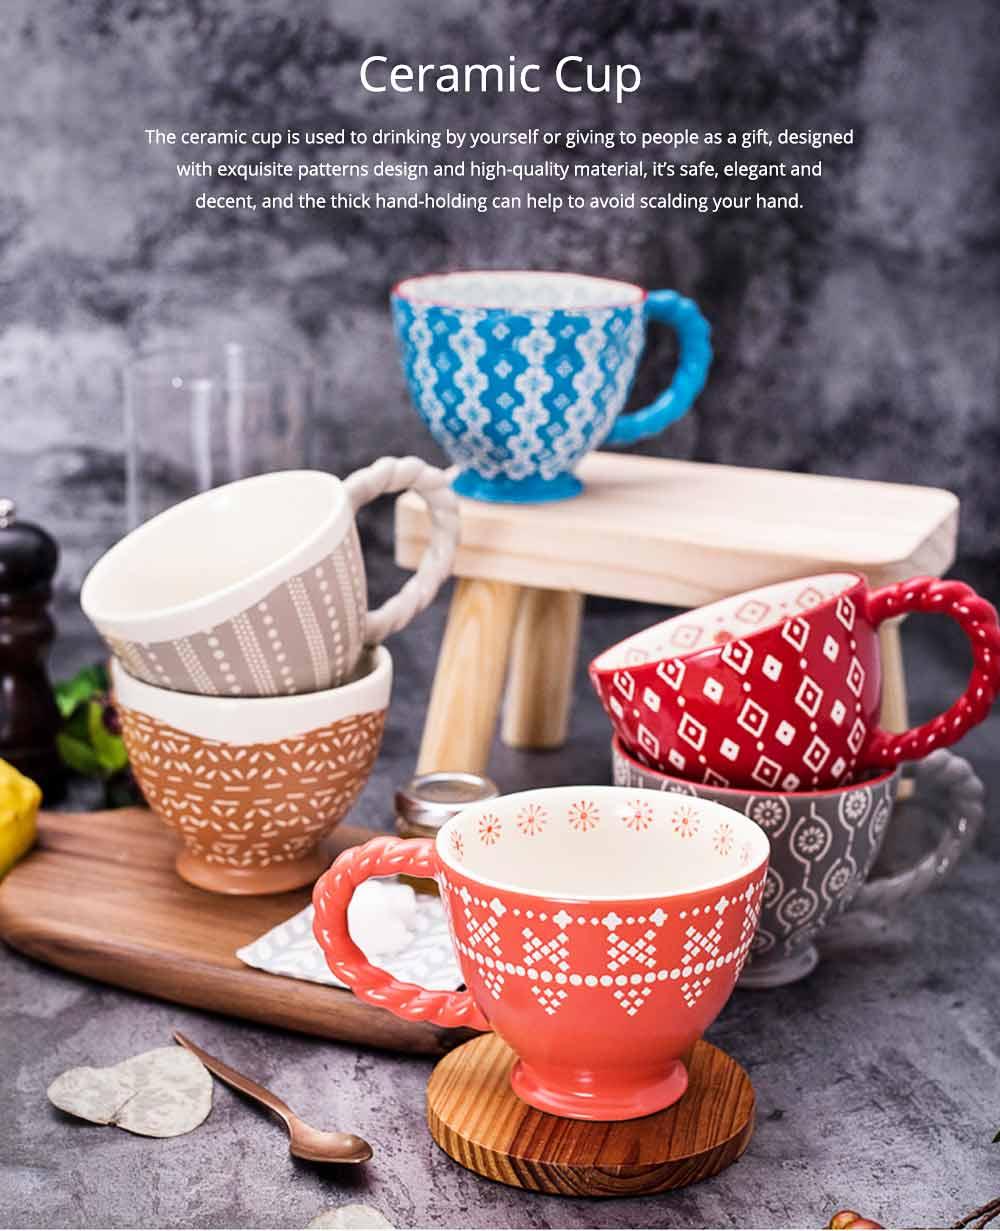 Ceramic Cup Breakfast Round Big Opening Mugs for Home Tea Milk Glazed white Porcelain Mug 0